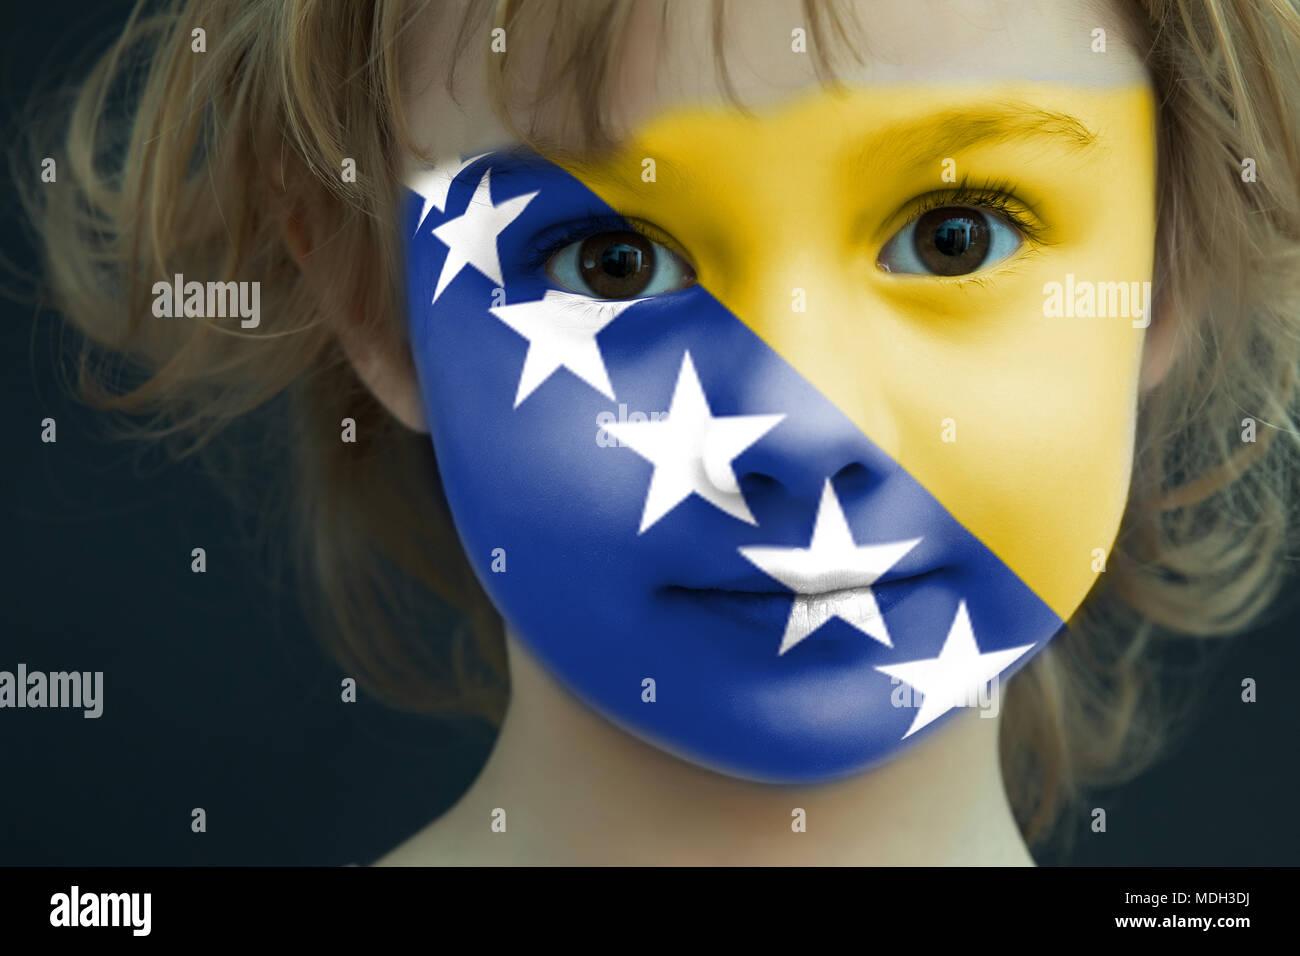 Child with a painted flag of Bosnia-Herzegovina - Stock Image